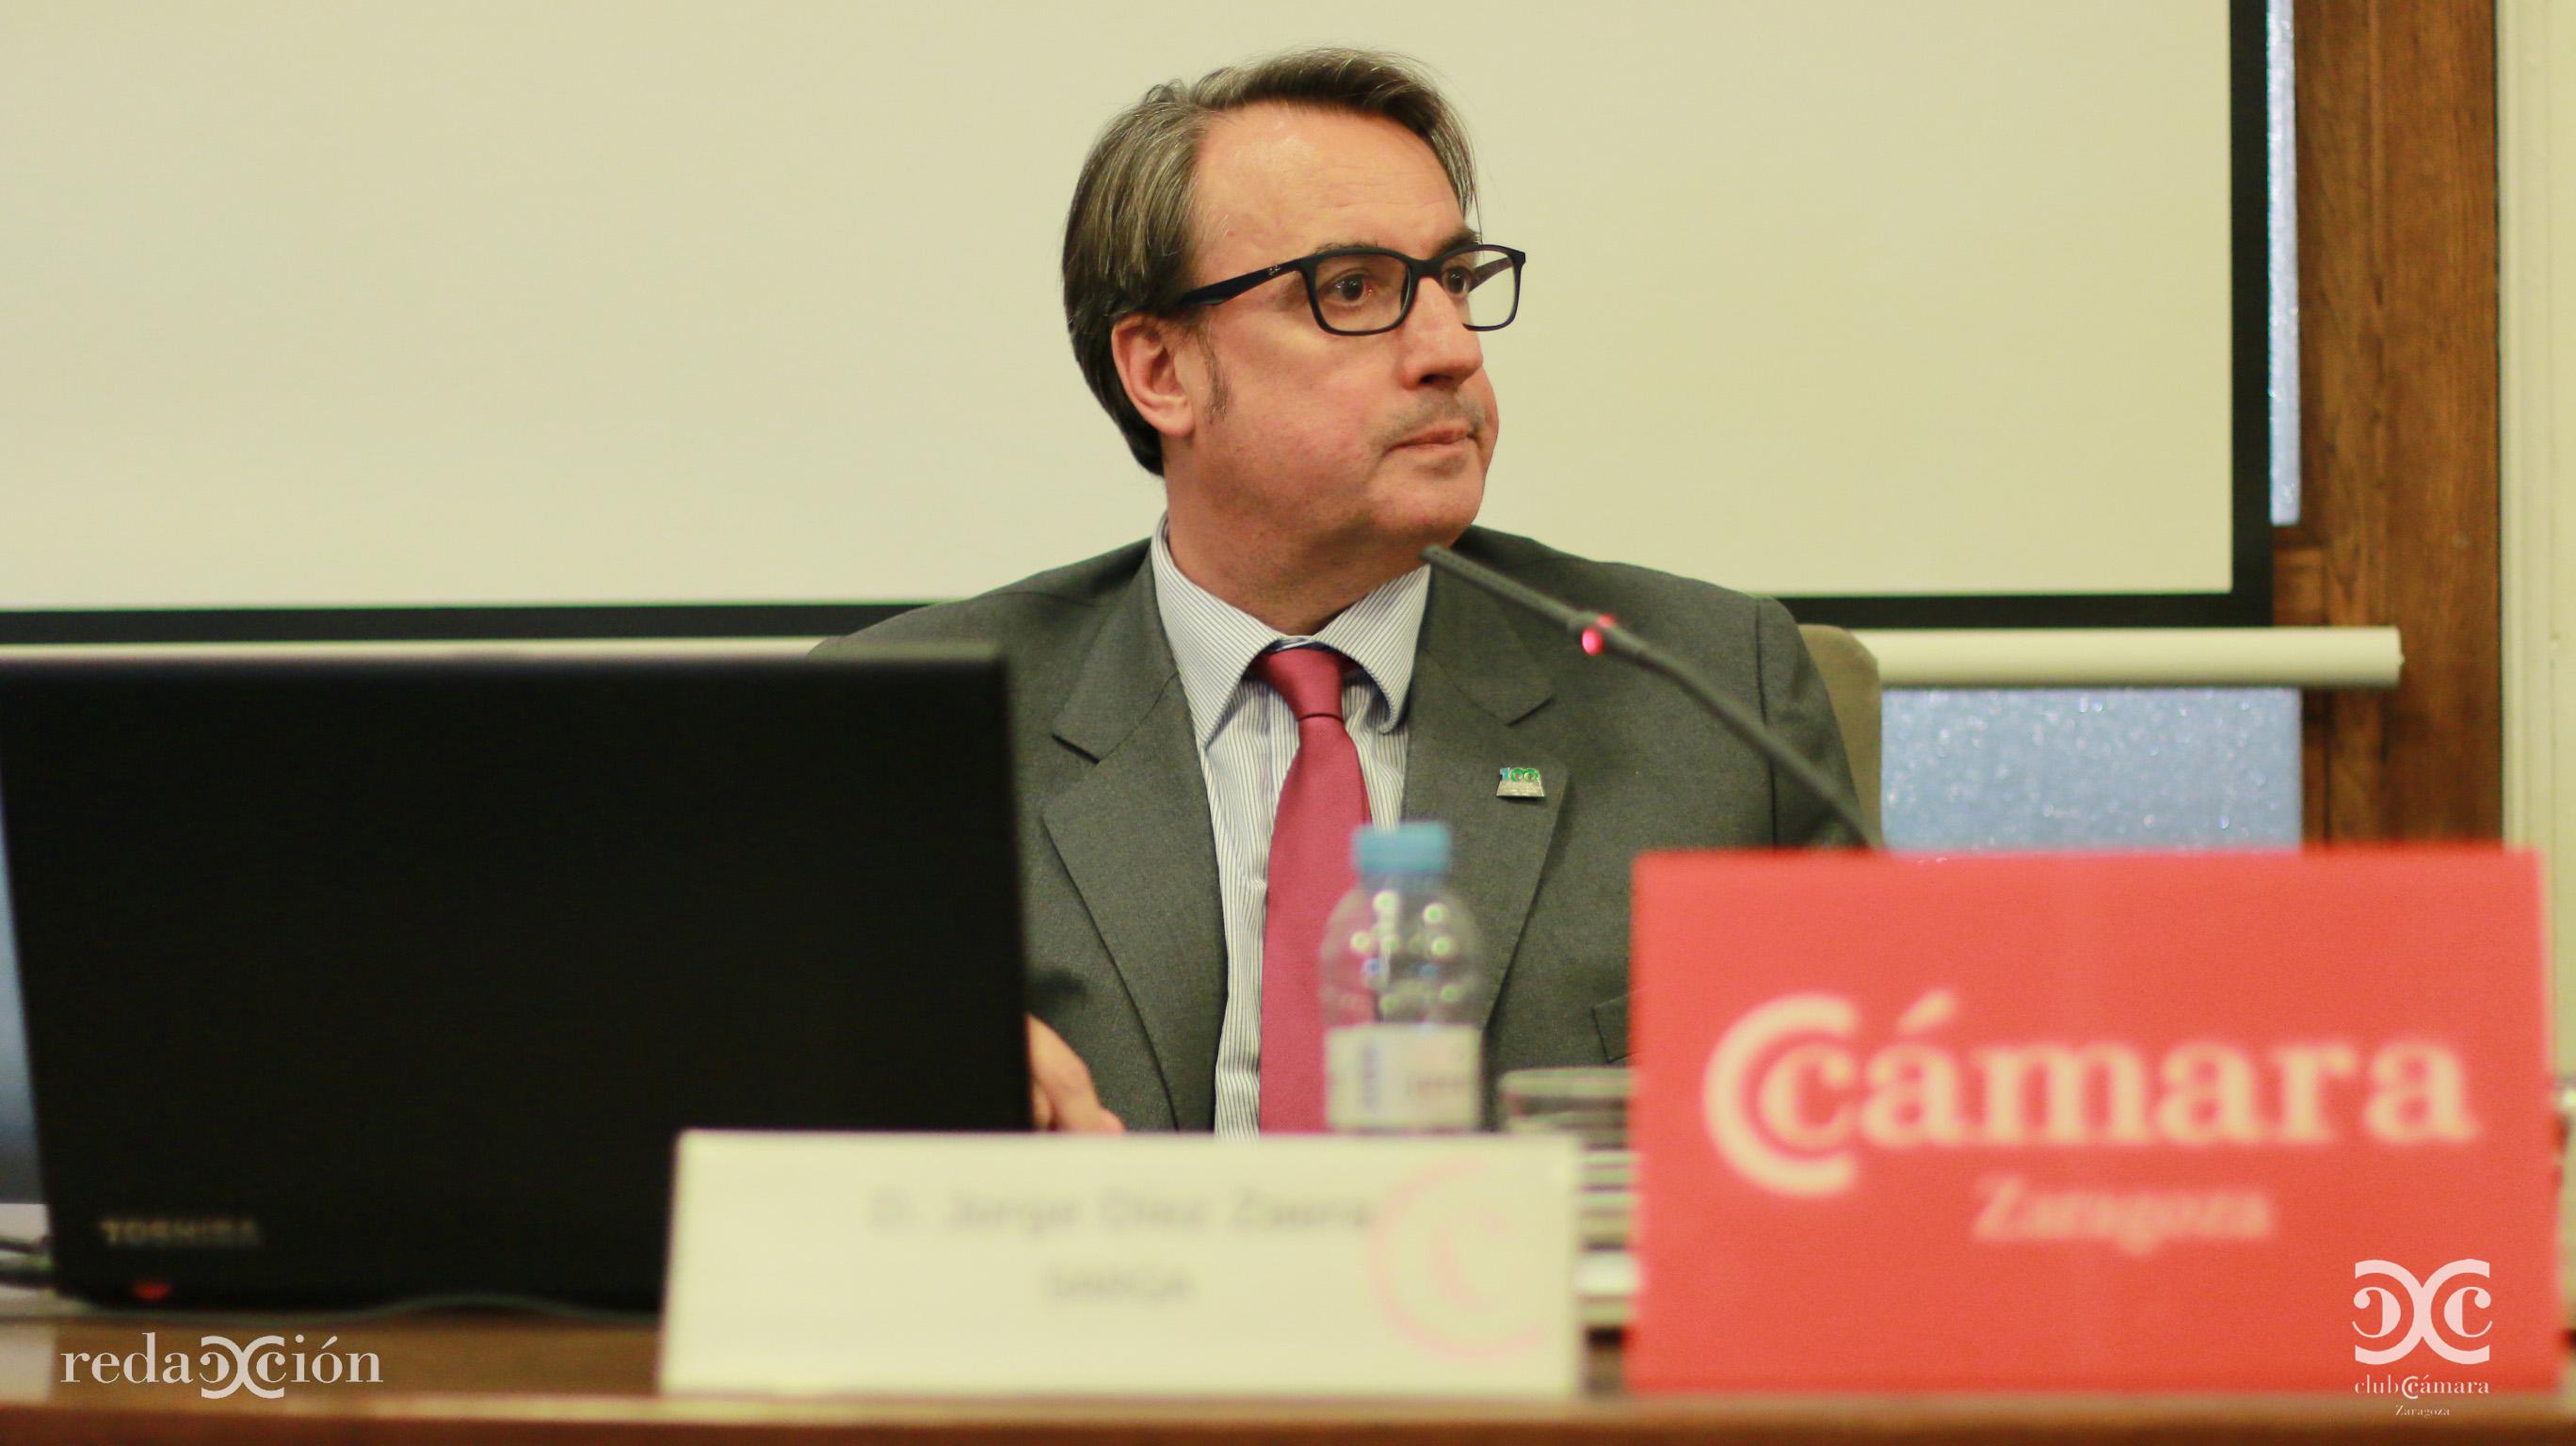 Jorge Díez Sarga